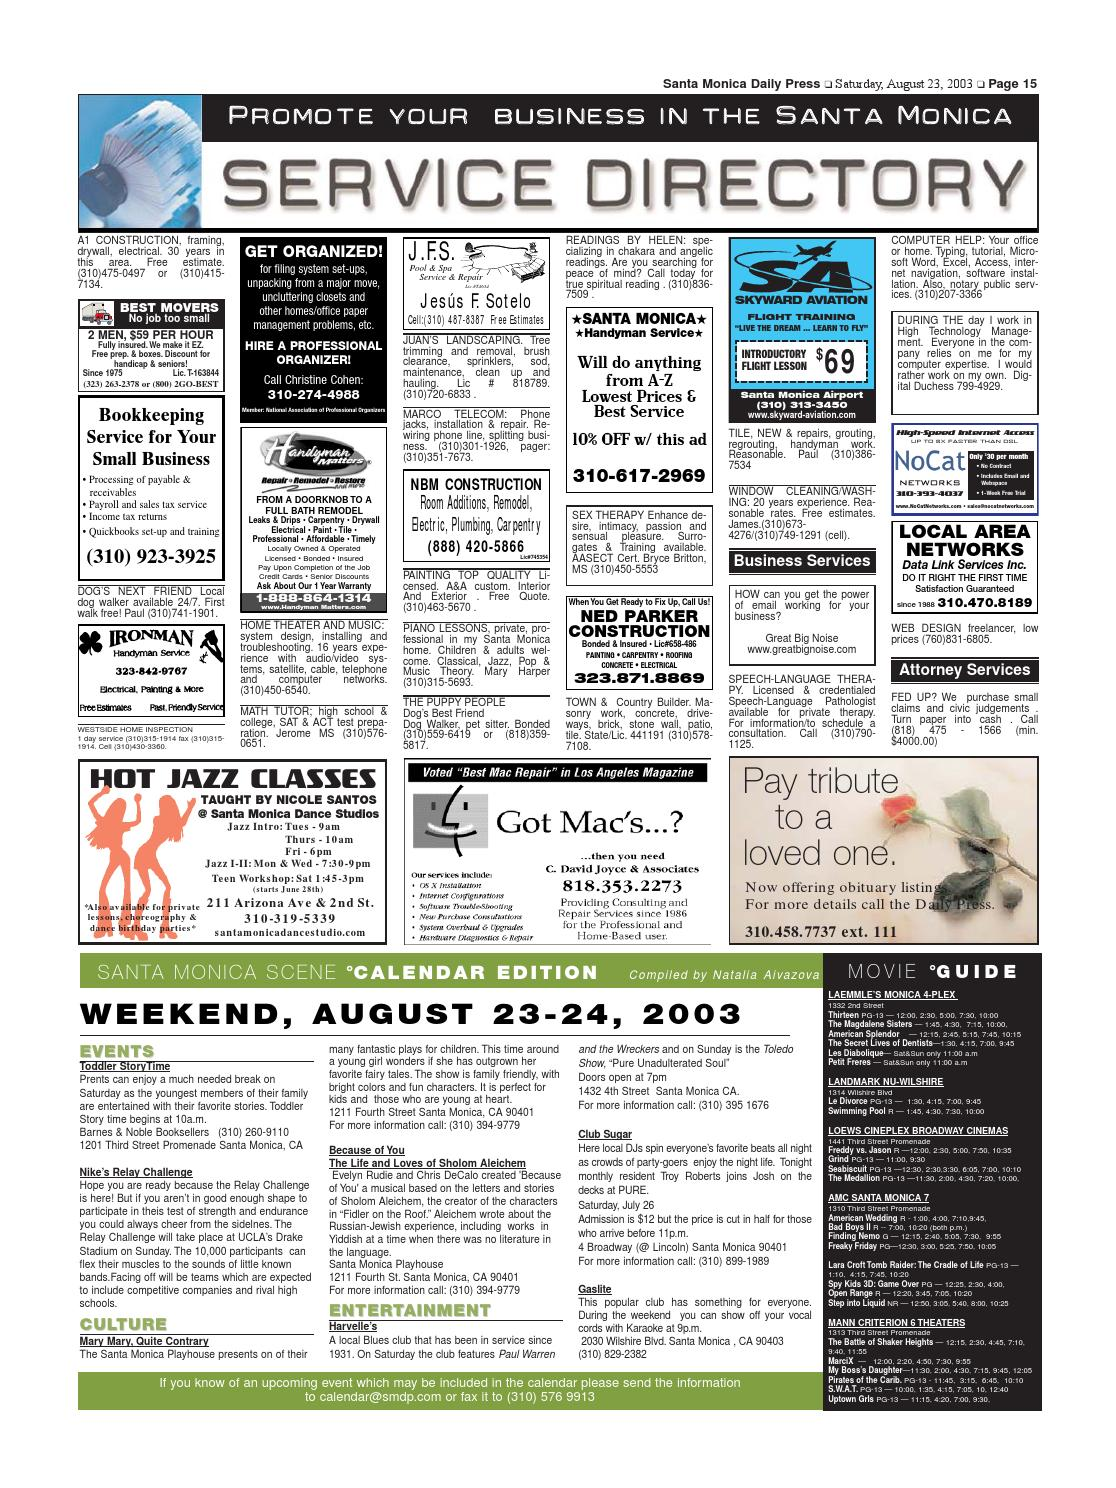 Santa Monica Daily Press August 23 2003